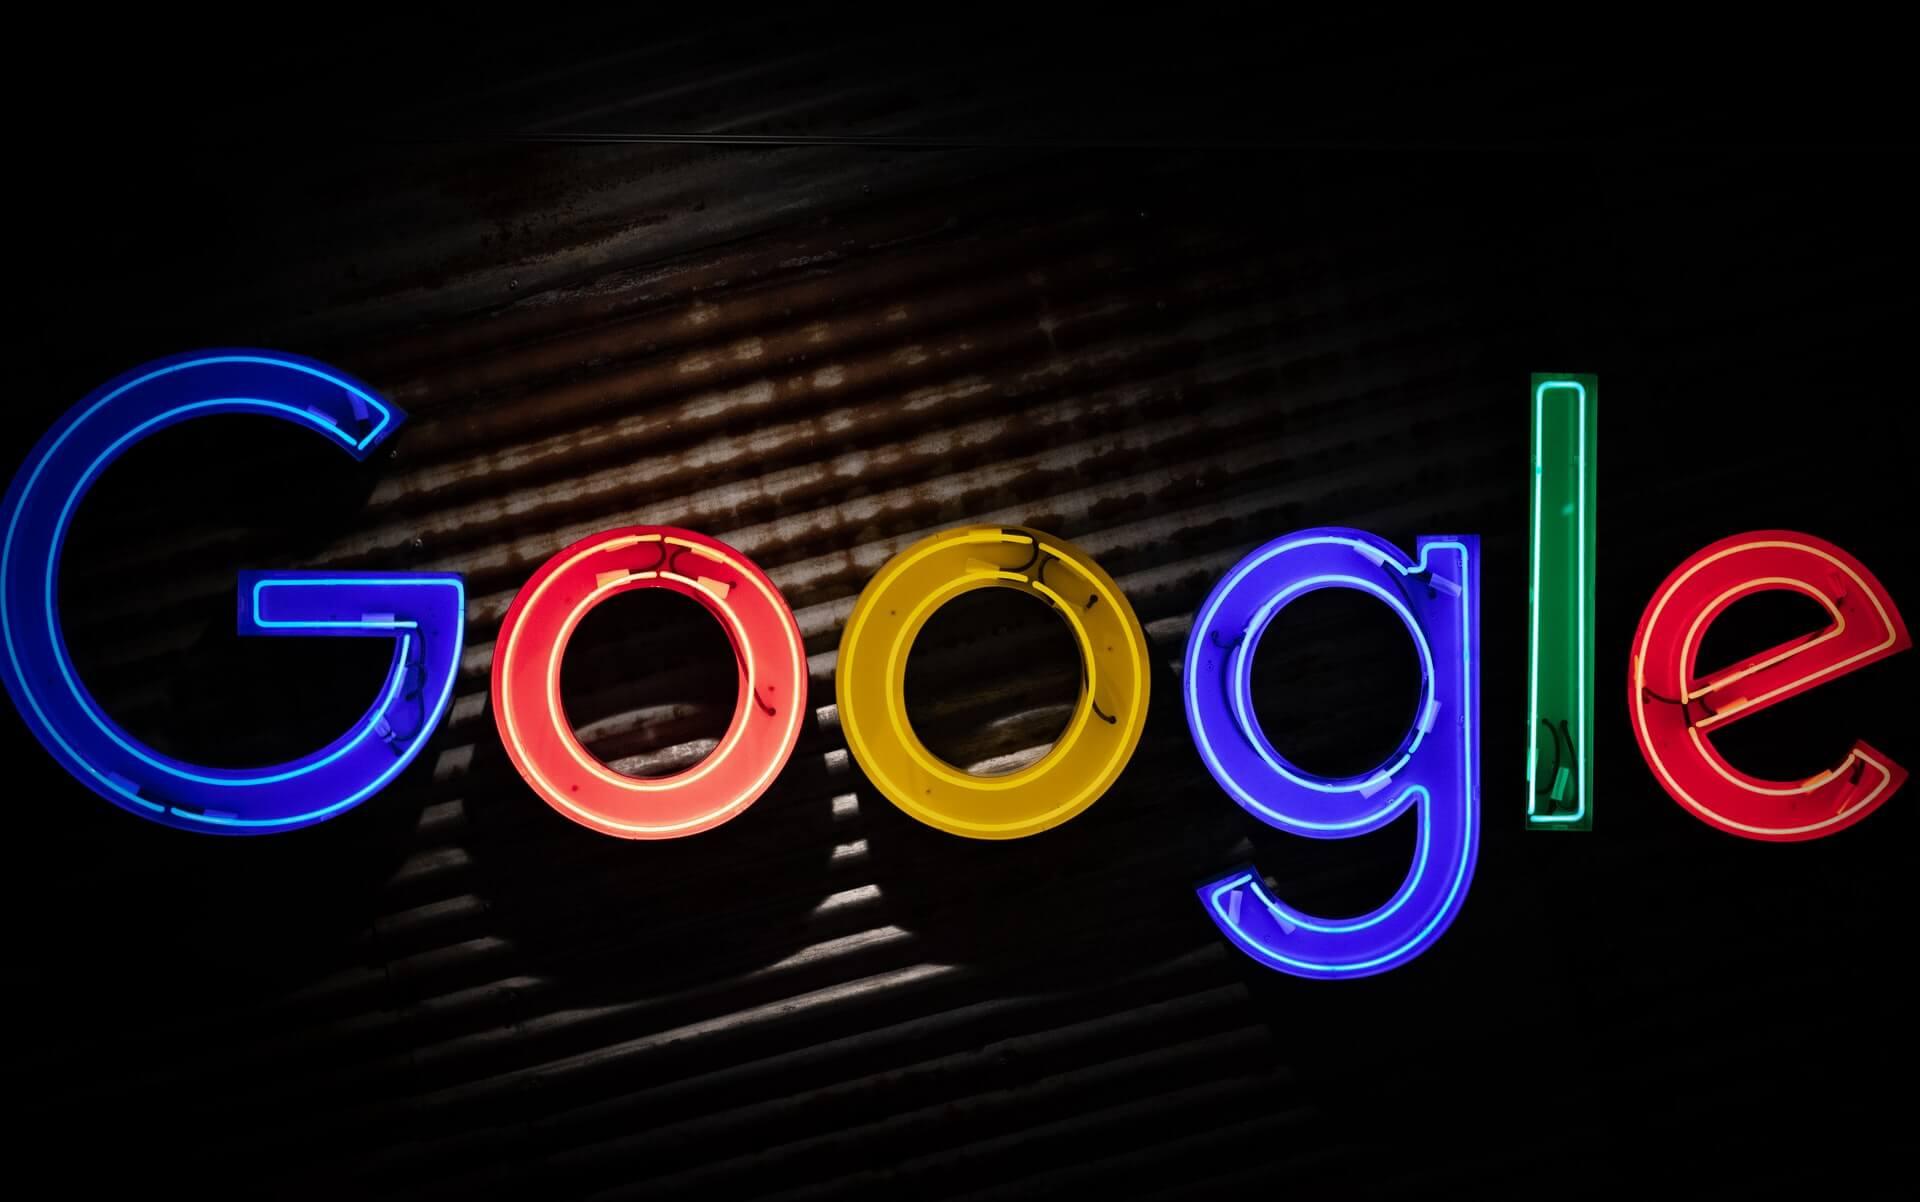 posicionamiento-erb-seo-google